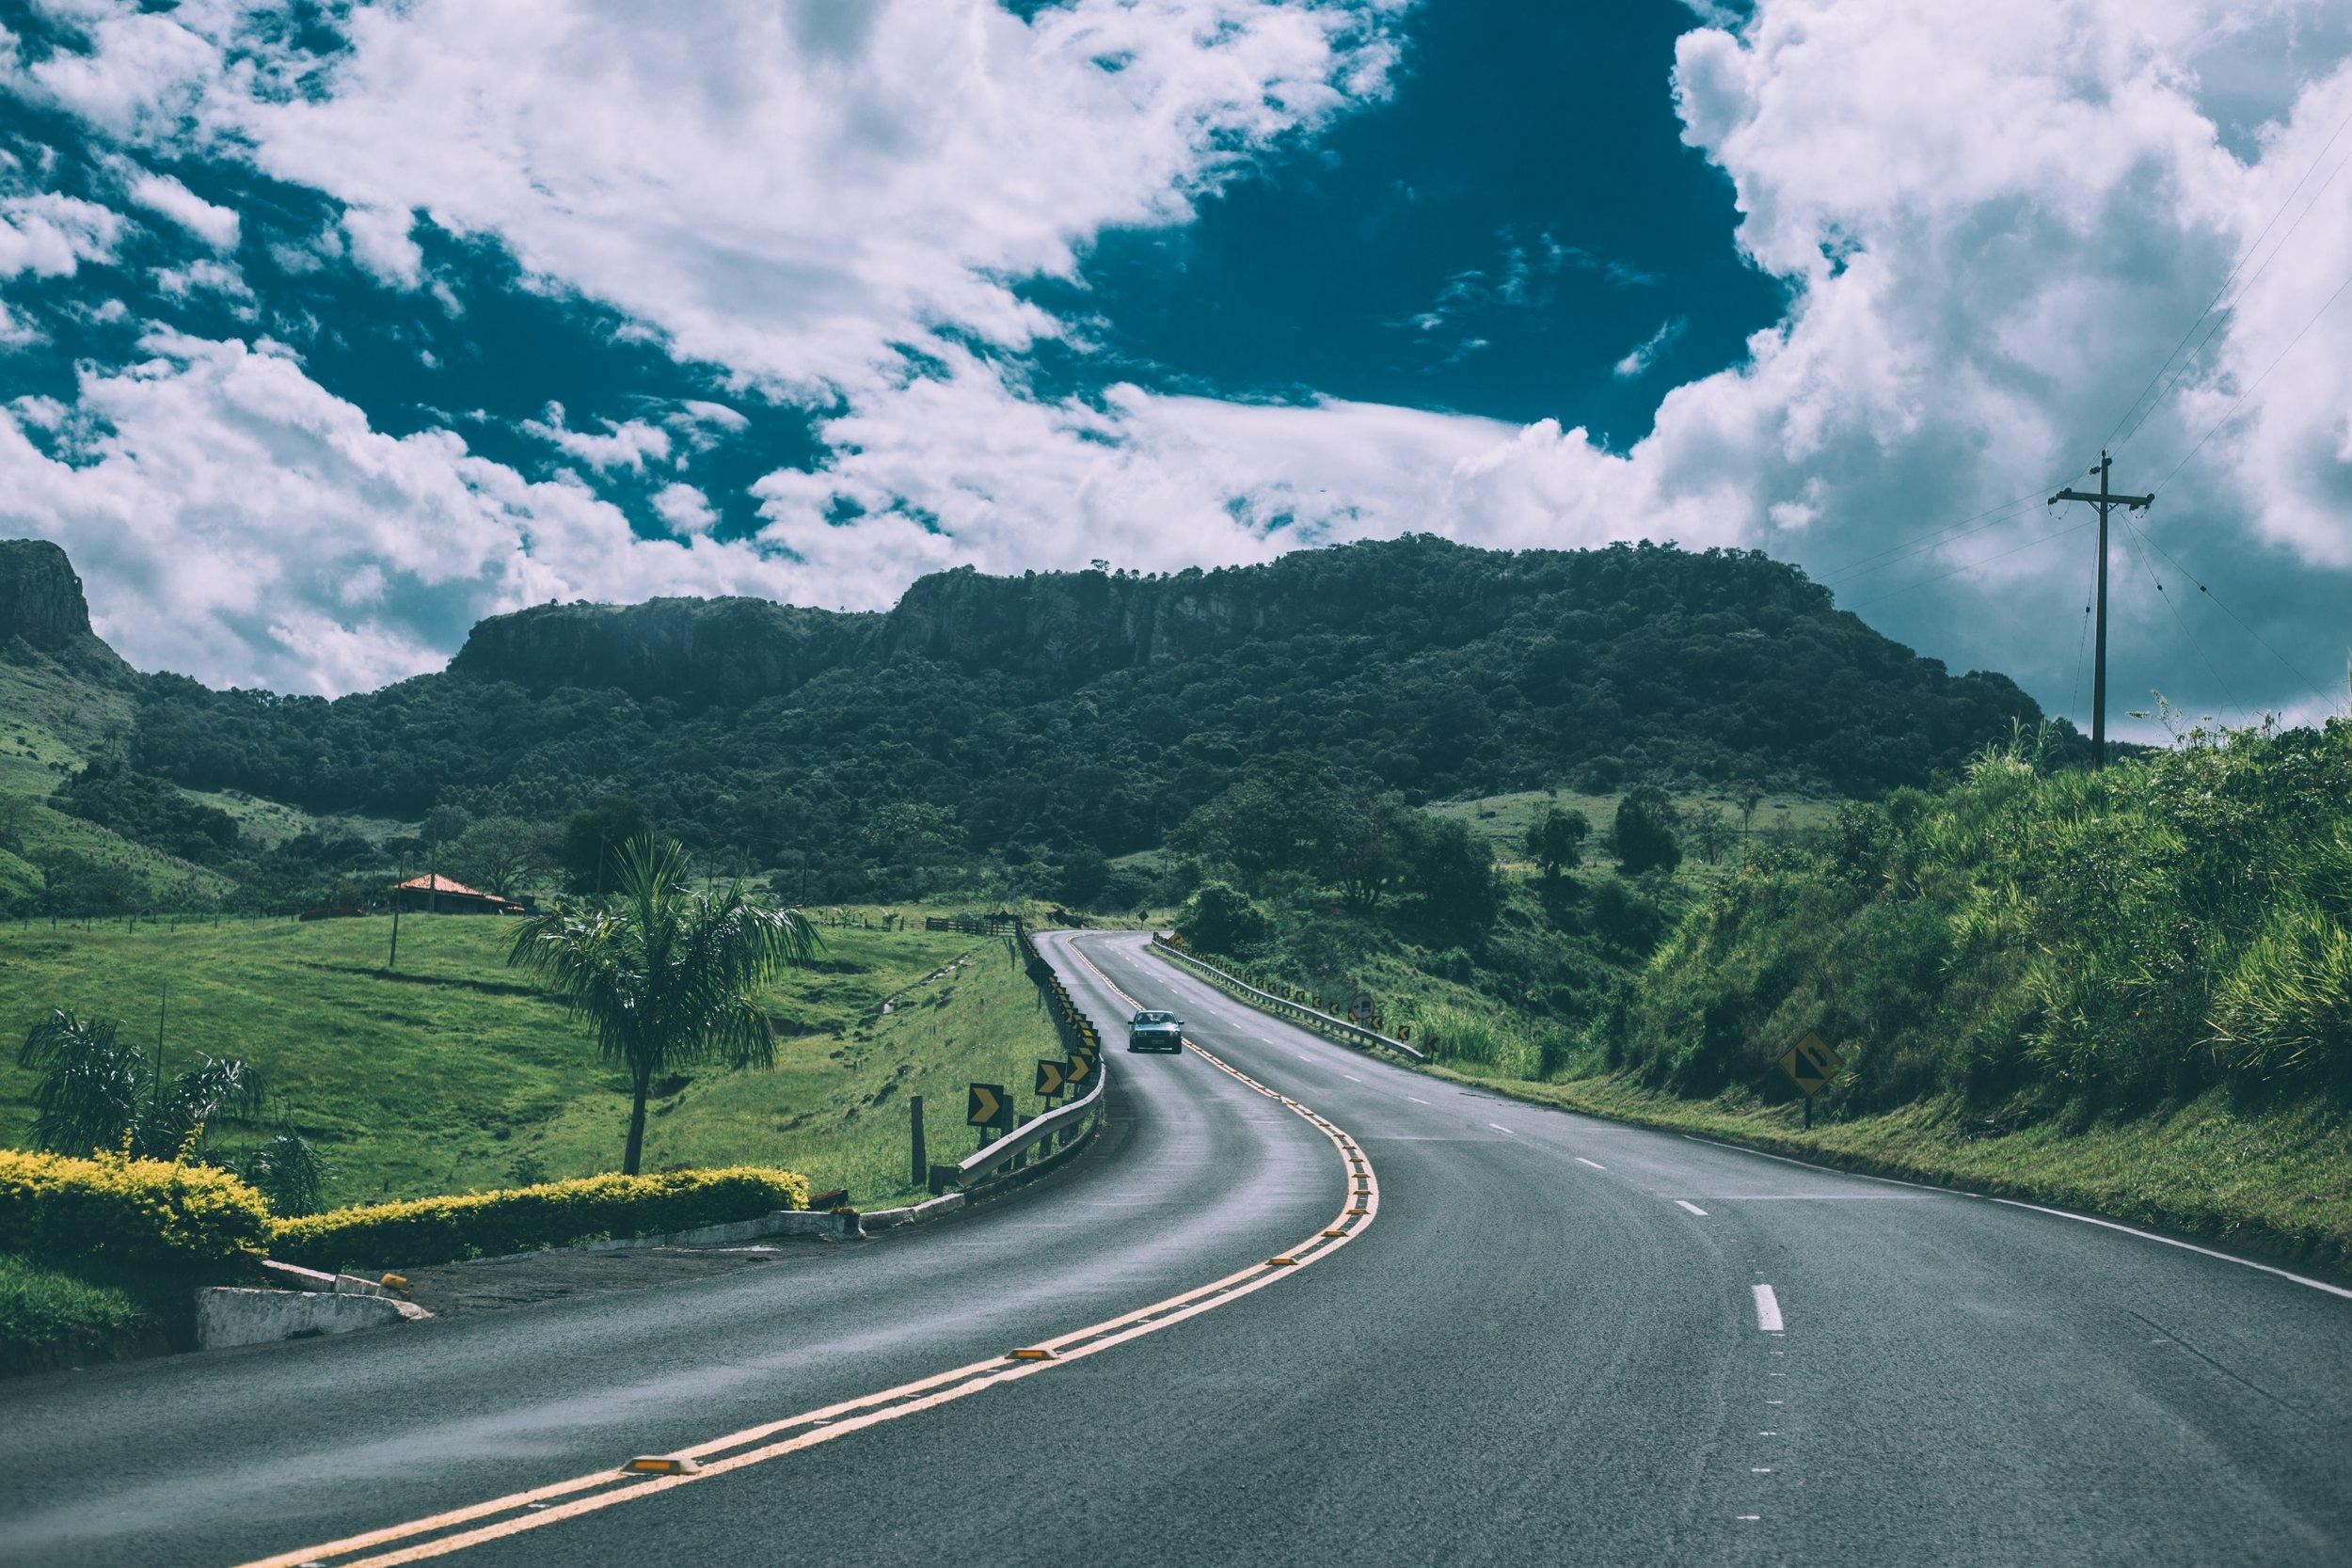 car-clouds-countryside-57645.jpg